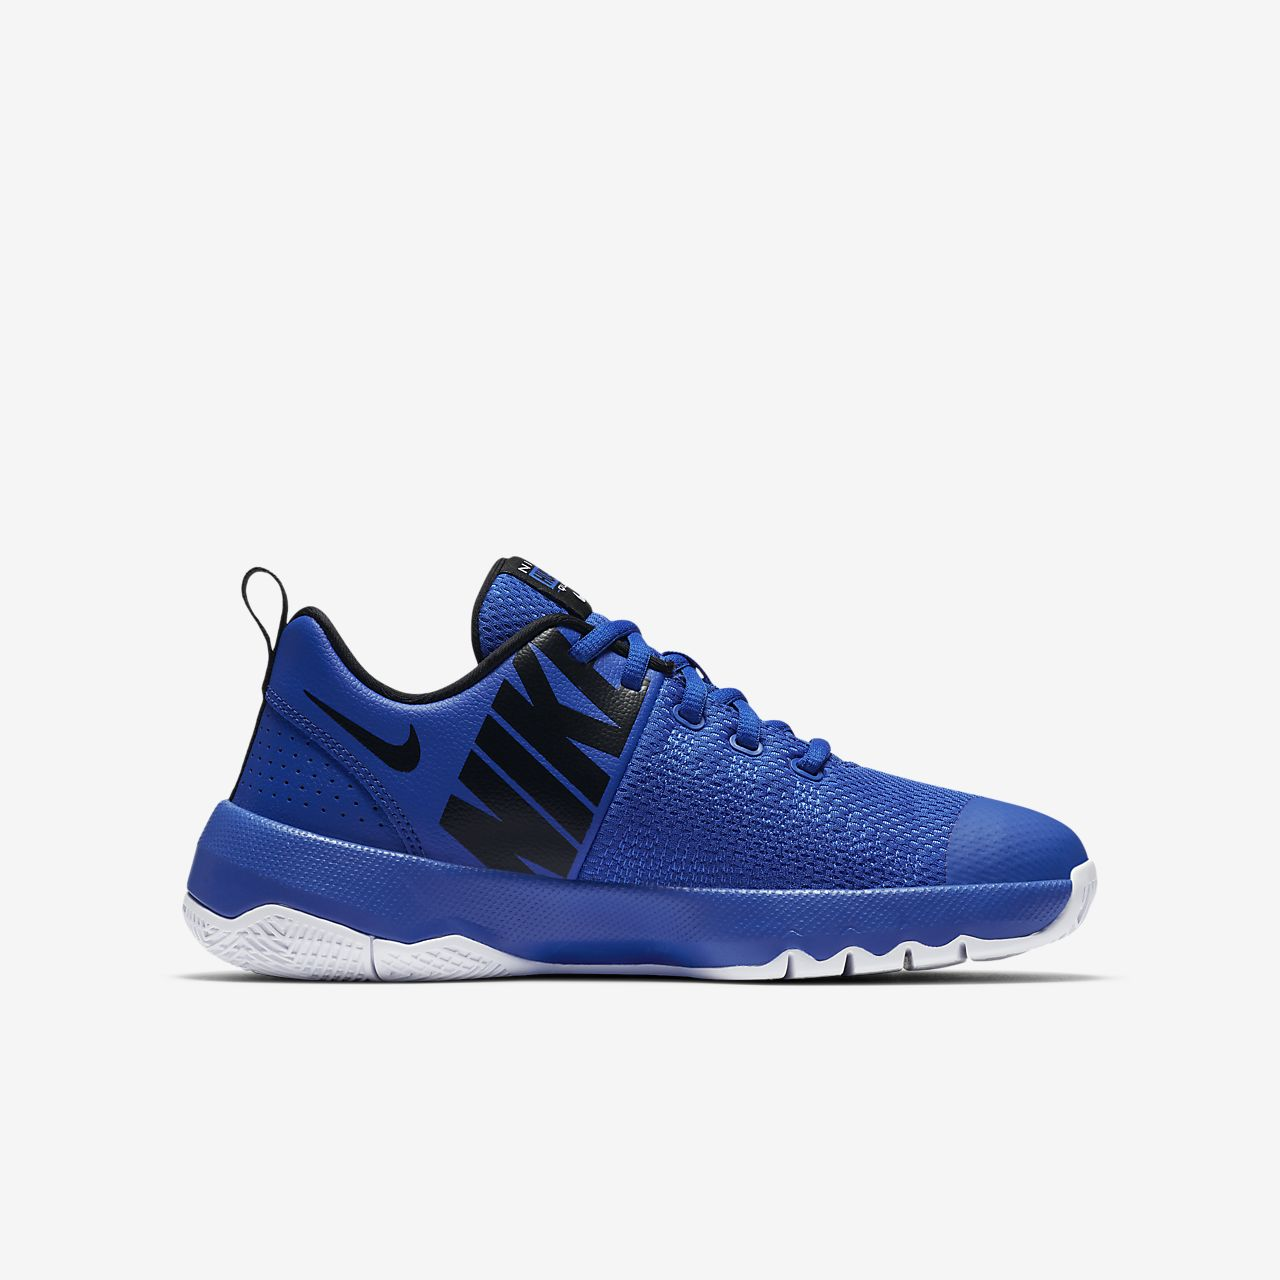 quality design 82b51 e8175 ... Nike Team Hustle Quick Big Kids  Basketball Shoe